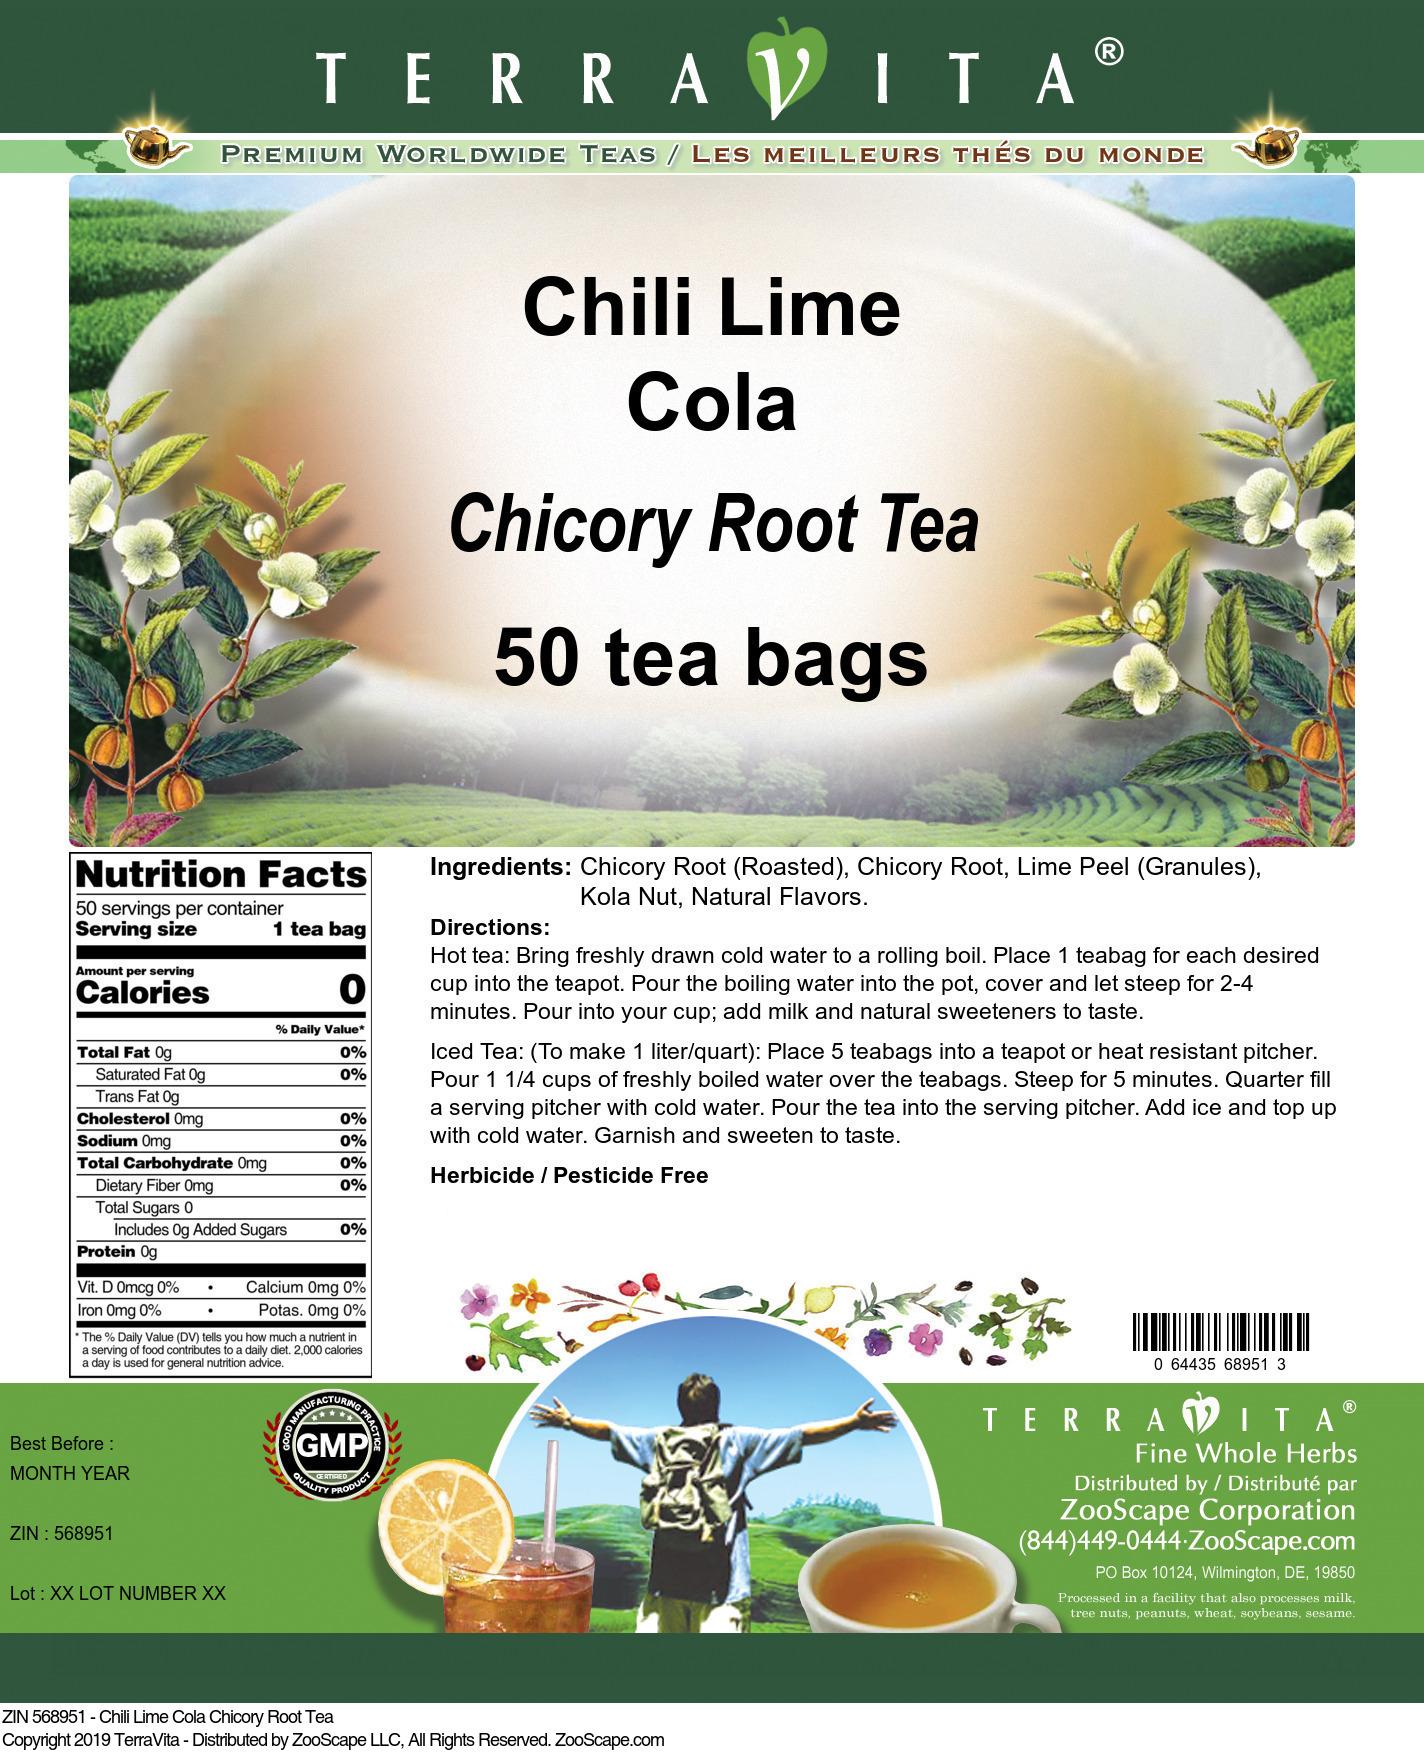 Chili Lime Cola Chicory Root